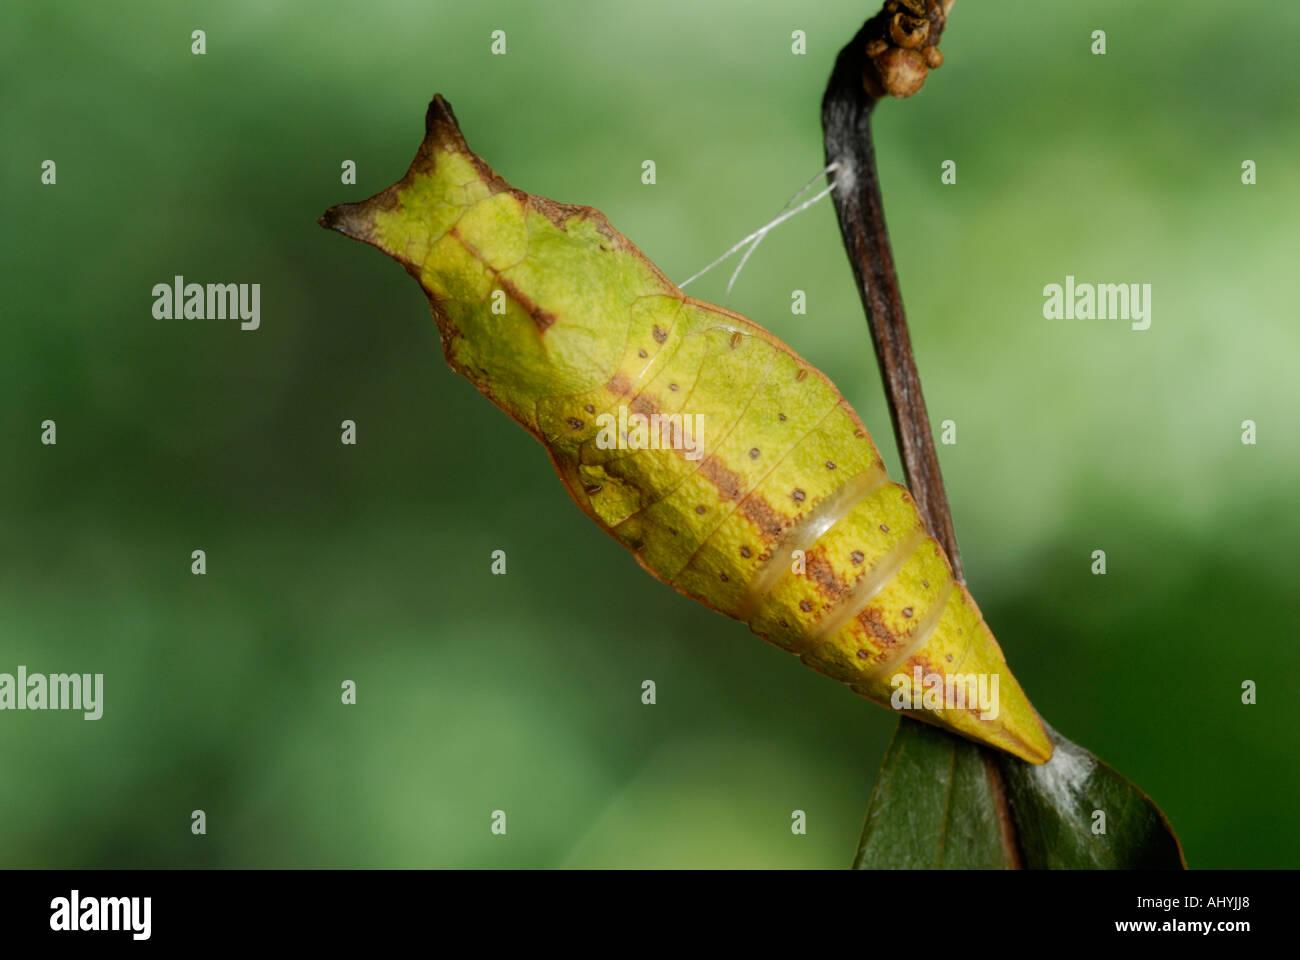 Especie Spicebush, Papilio Troilo, chrysalis pupa Foto de stock